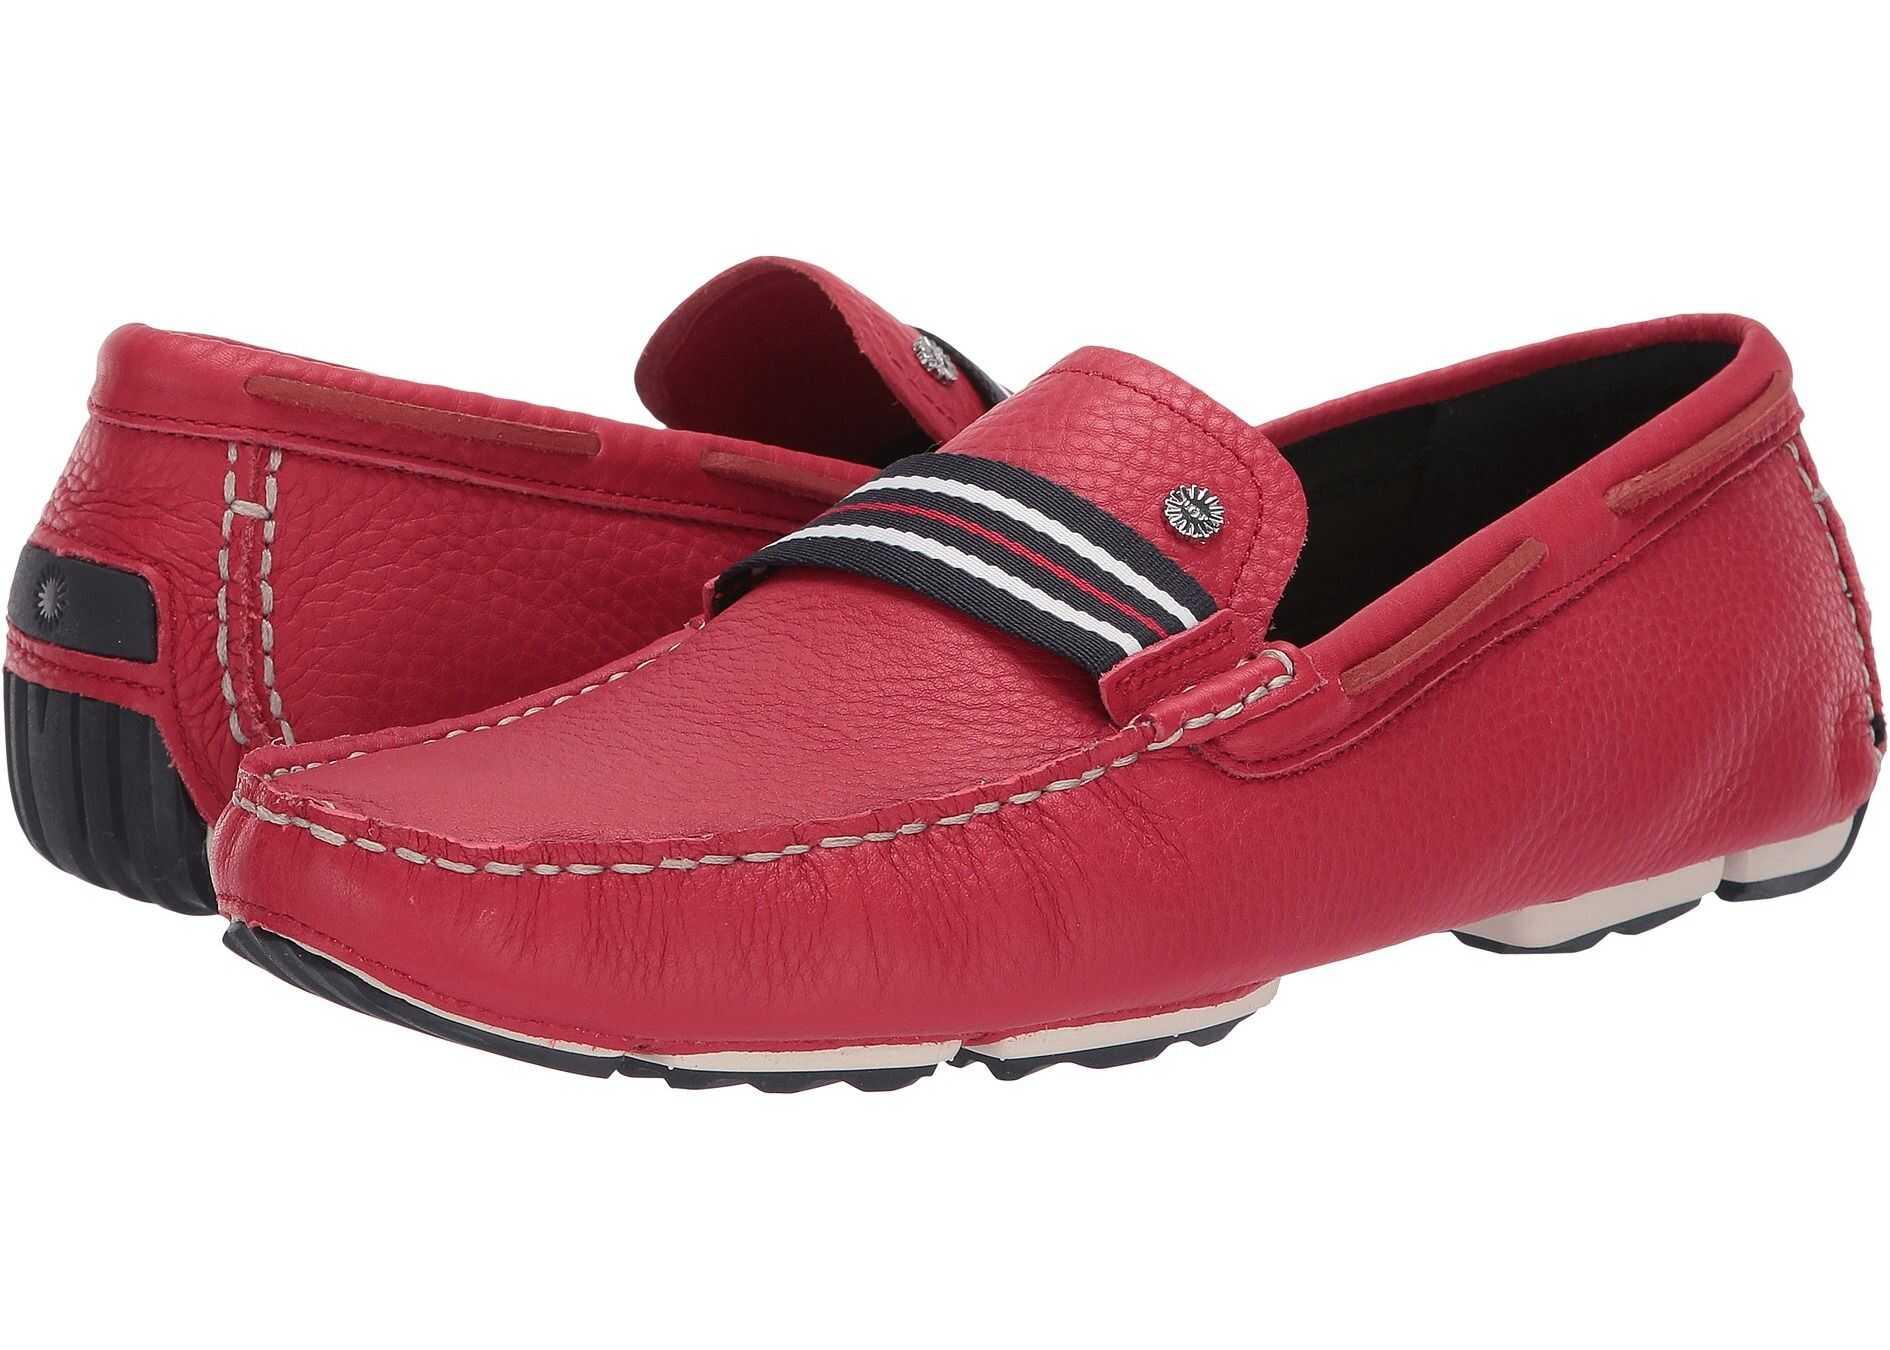 UGG Bel-Air Woven Stripe Slip-On Samba Red